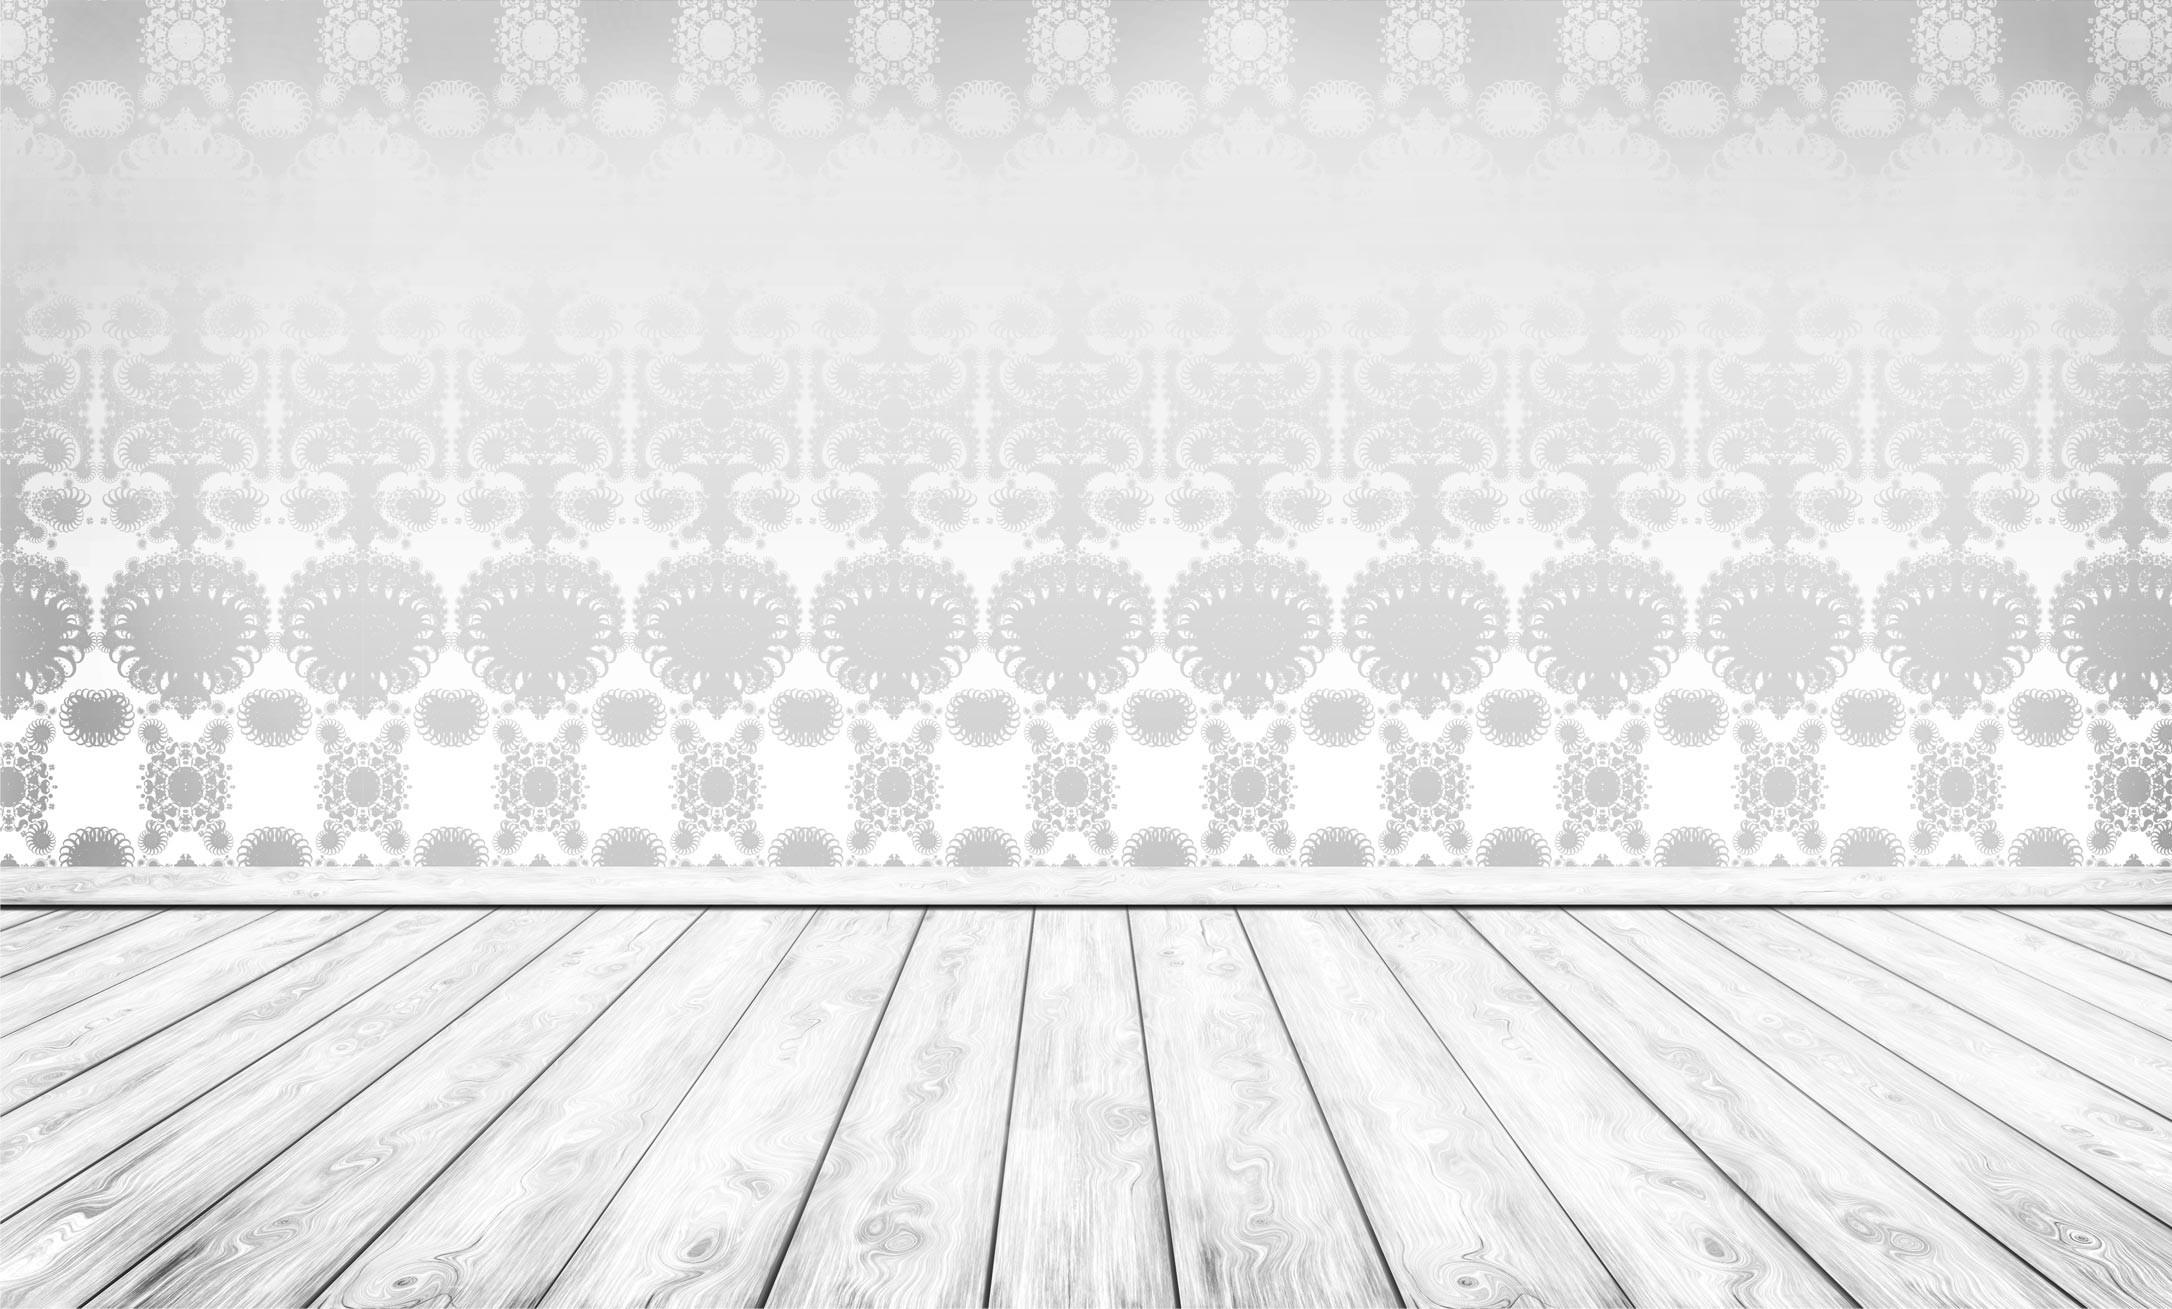 Black And Silver Damask Wallpaper 25 Hd Wallpaper. Black And Silver Damask  Wallpaper 25 Hd Wallpaper